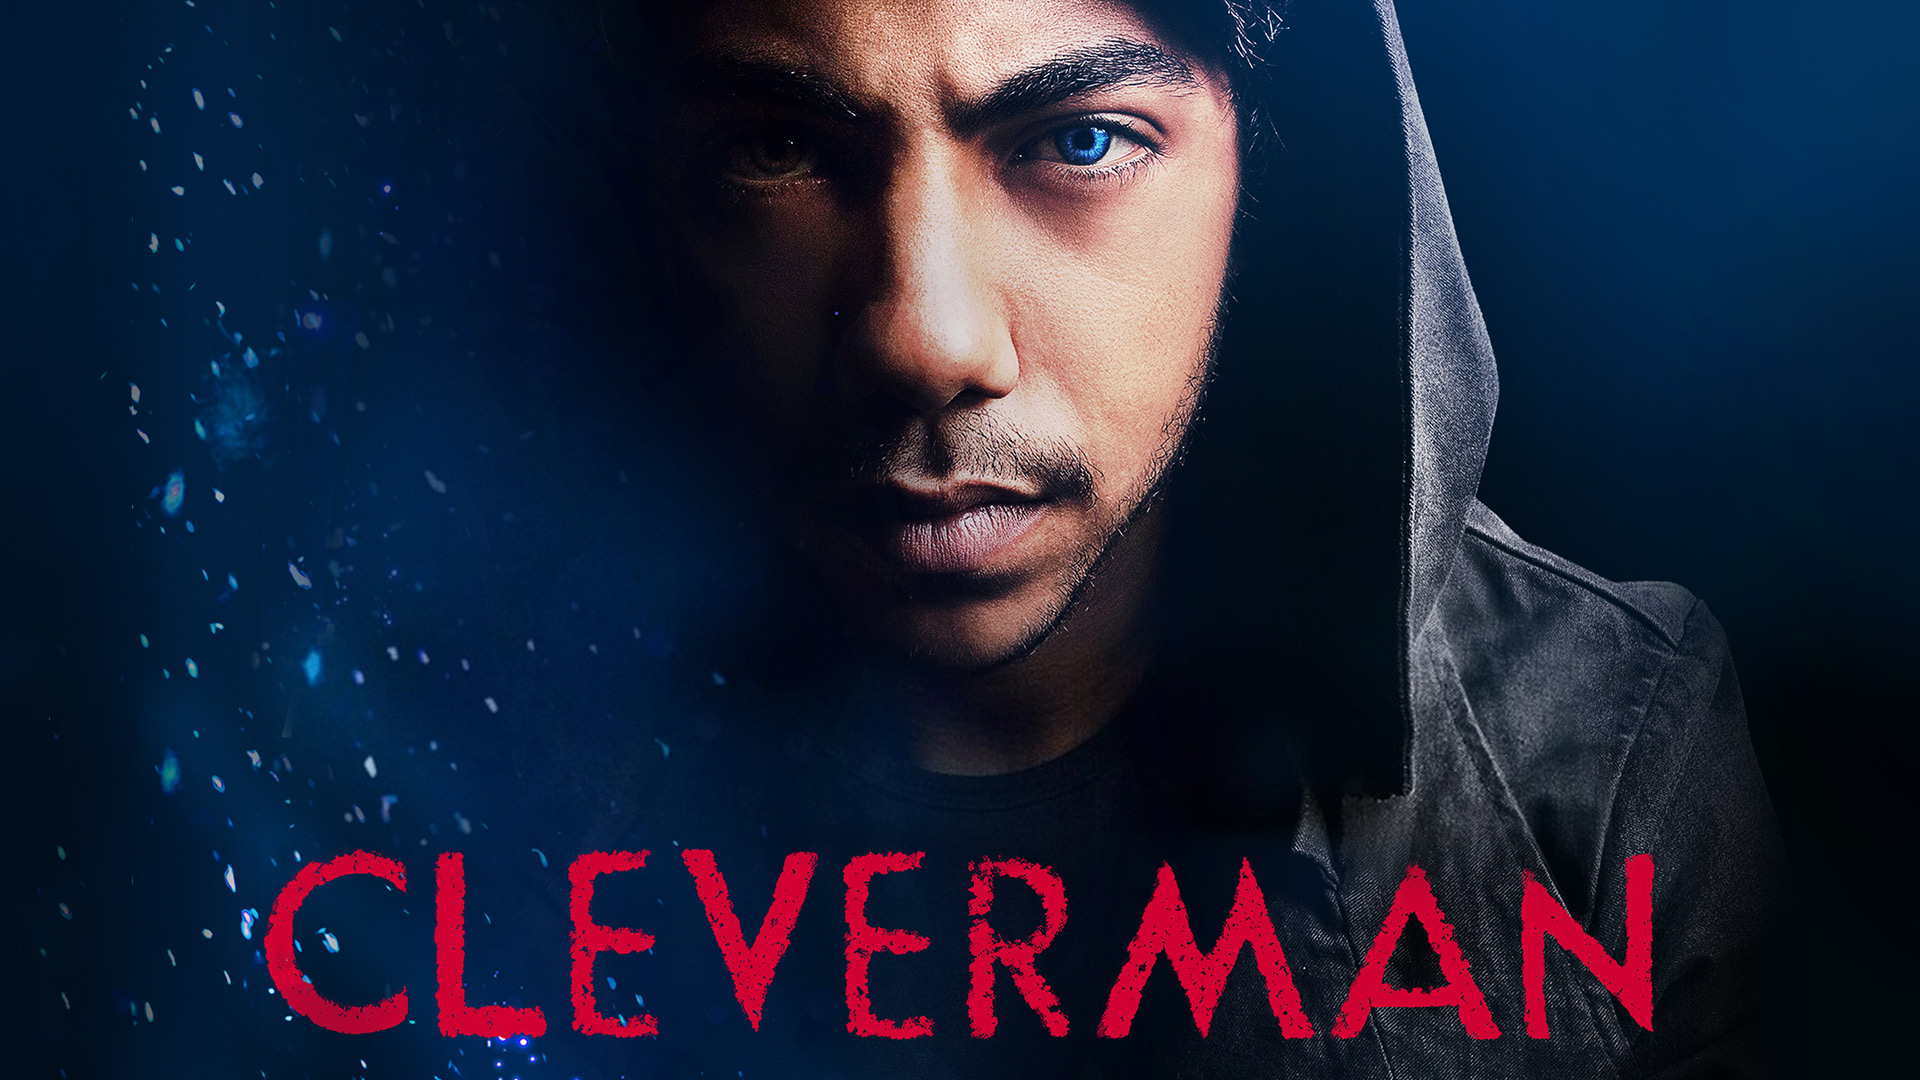 Cleverman Season 1